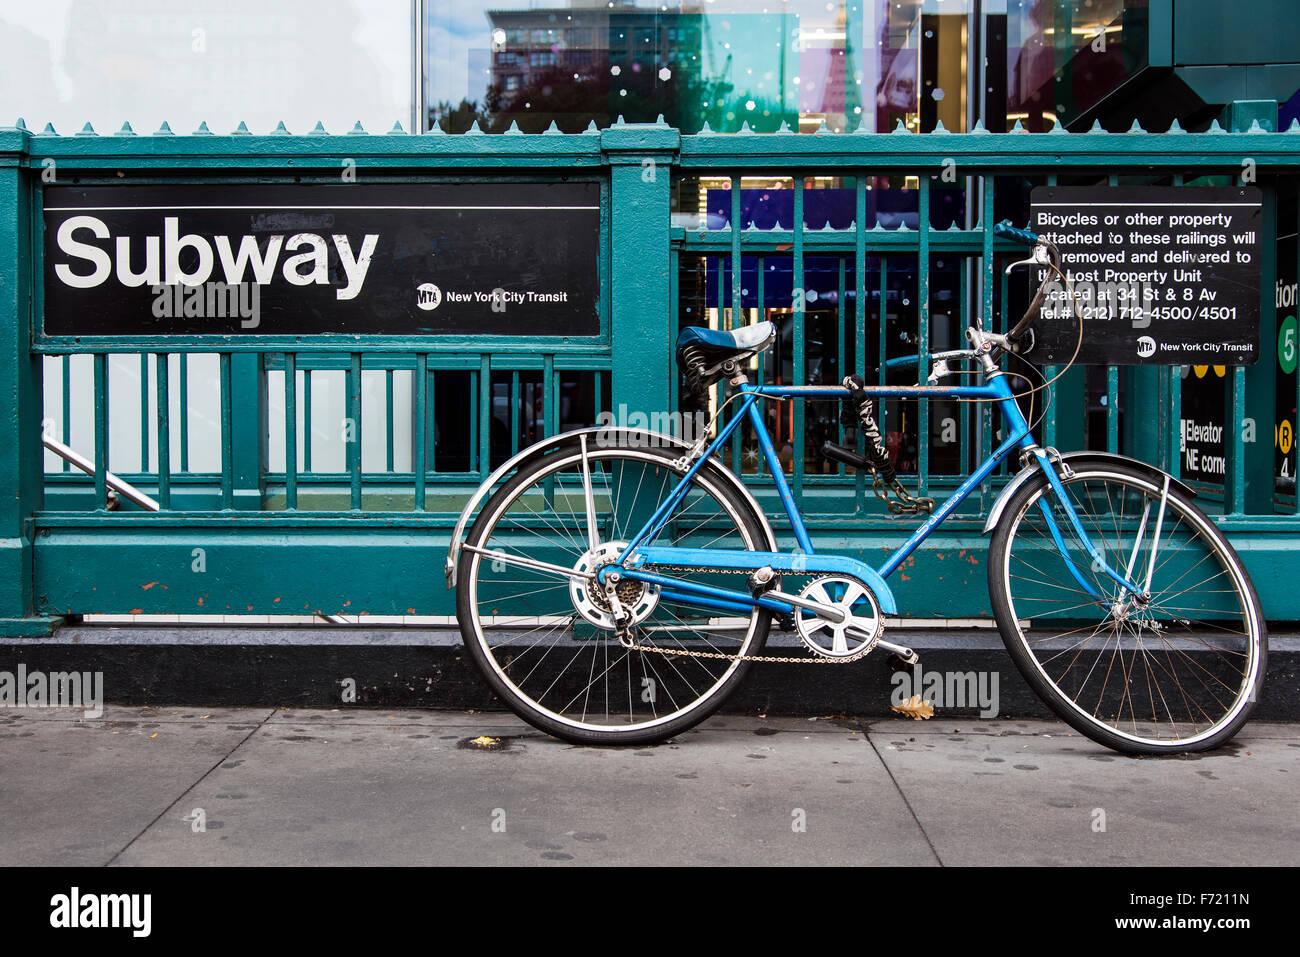 Entrance of Subway station, Manhattan, New York, USA - Stock Image